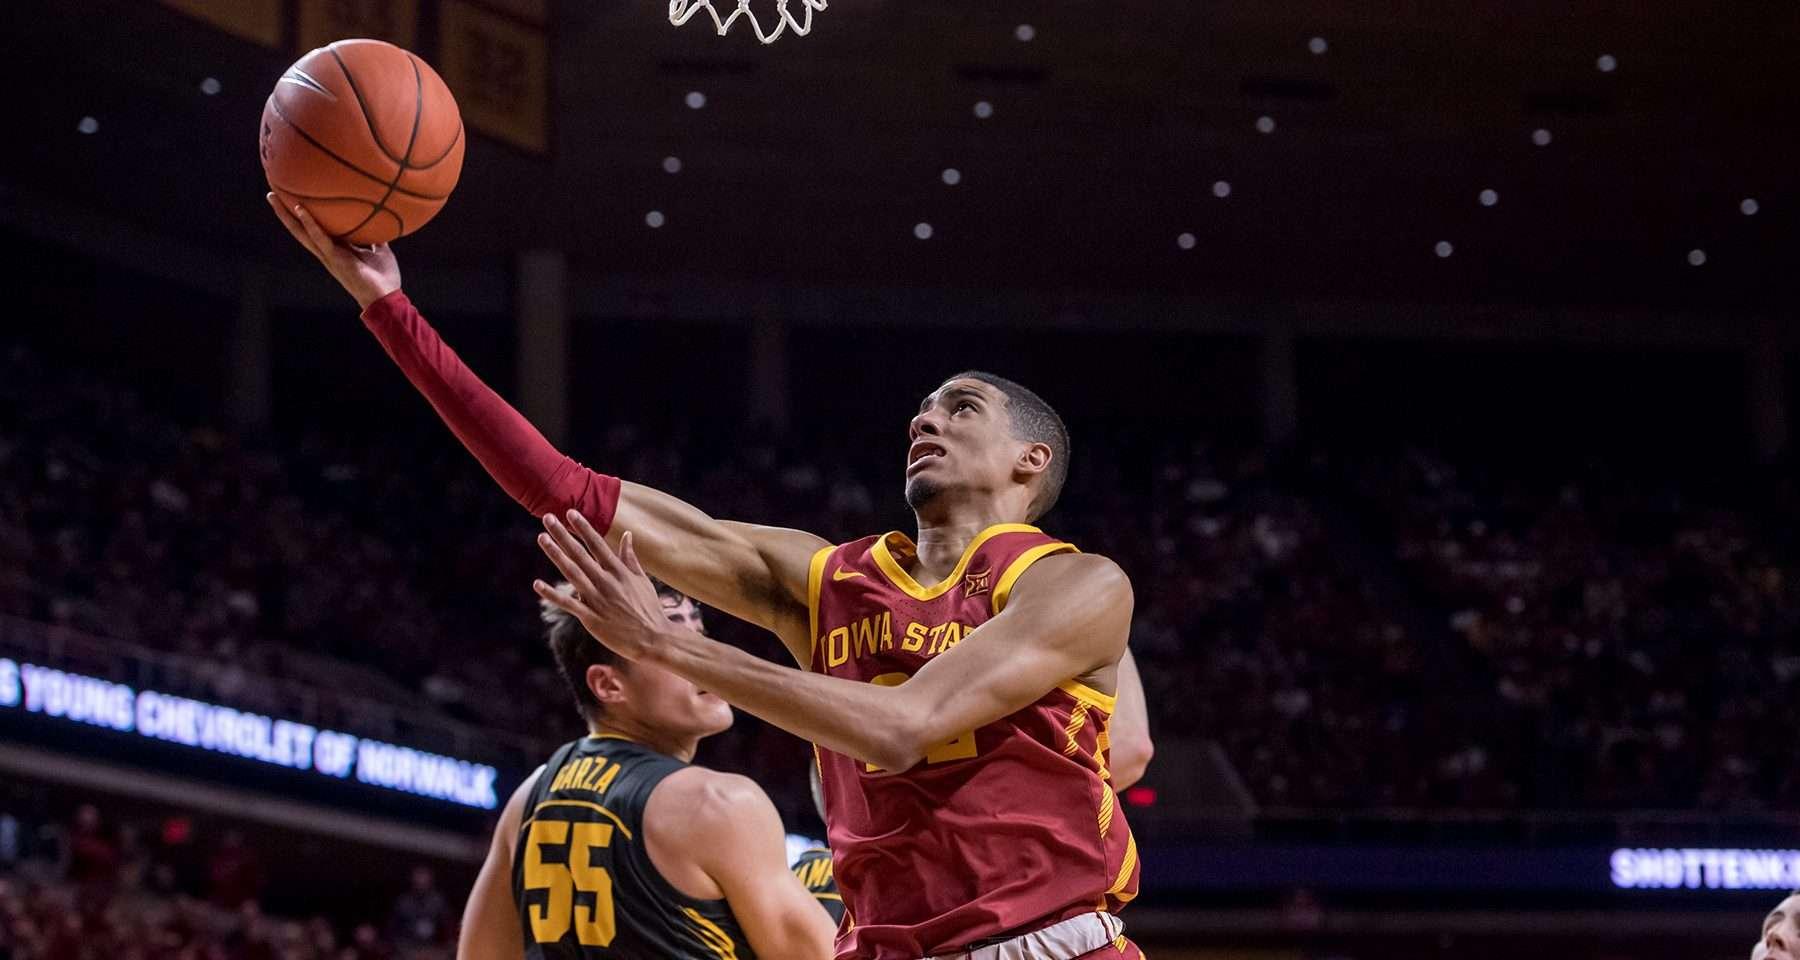 Tyrese Haliburton-Iowa State Cyclones-Steve Prohm-Tyrese Haliburton out for the season-Tyrese Haliburton projected lottery pick-2020 NBA Draft-